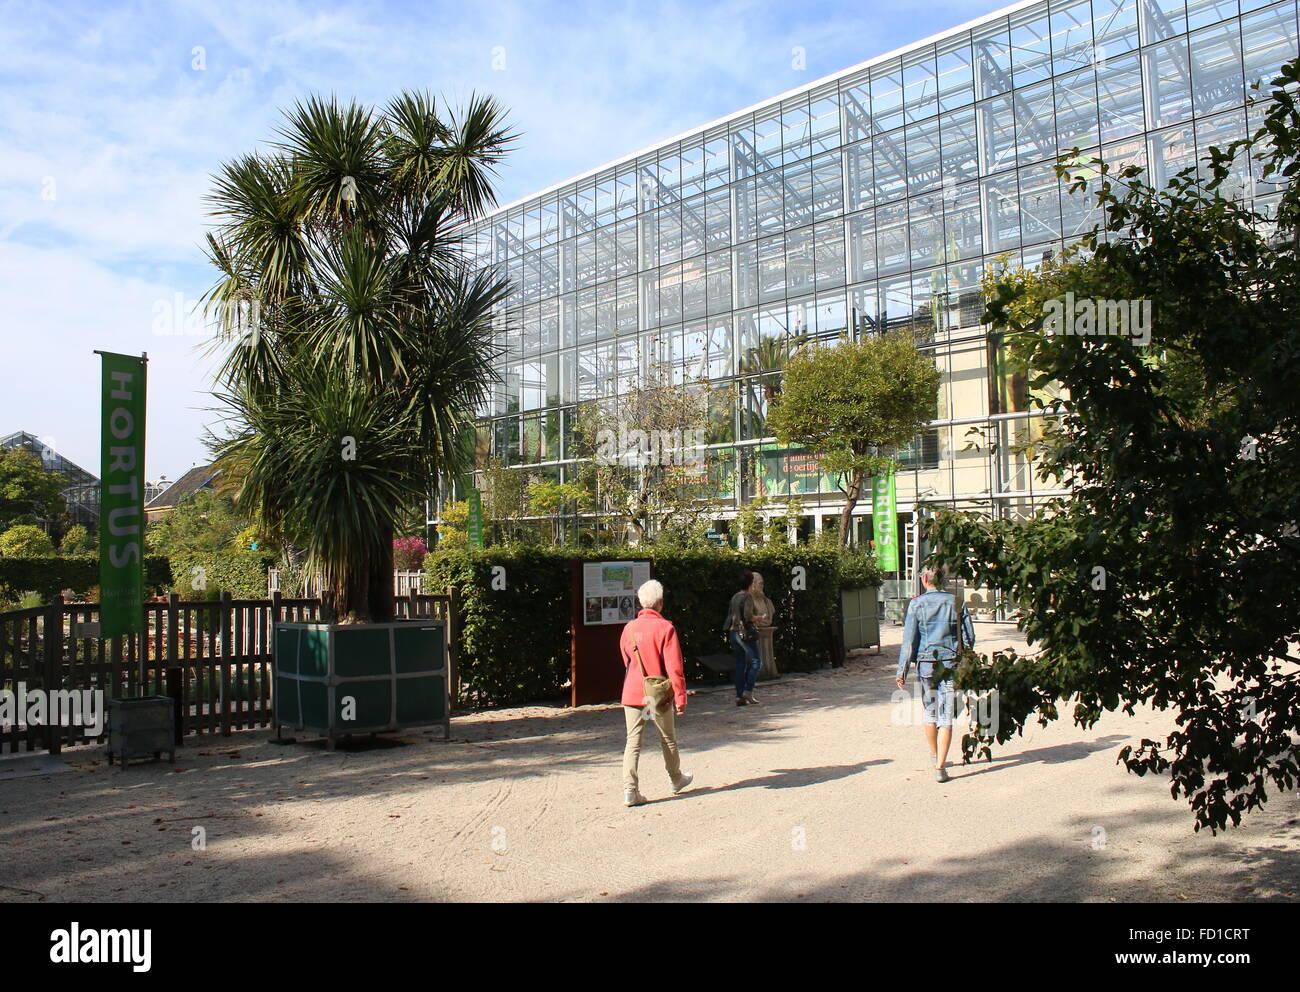 Botanische Tuin Leiden : Hortus botanicus leiden stock photos hortus botanicus leiden